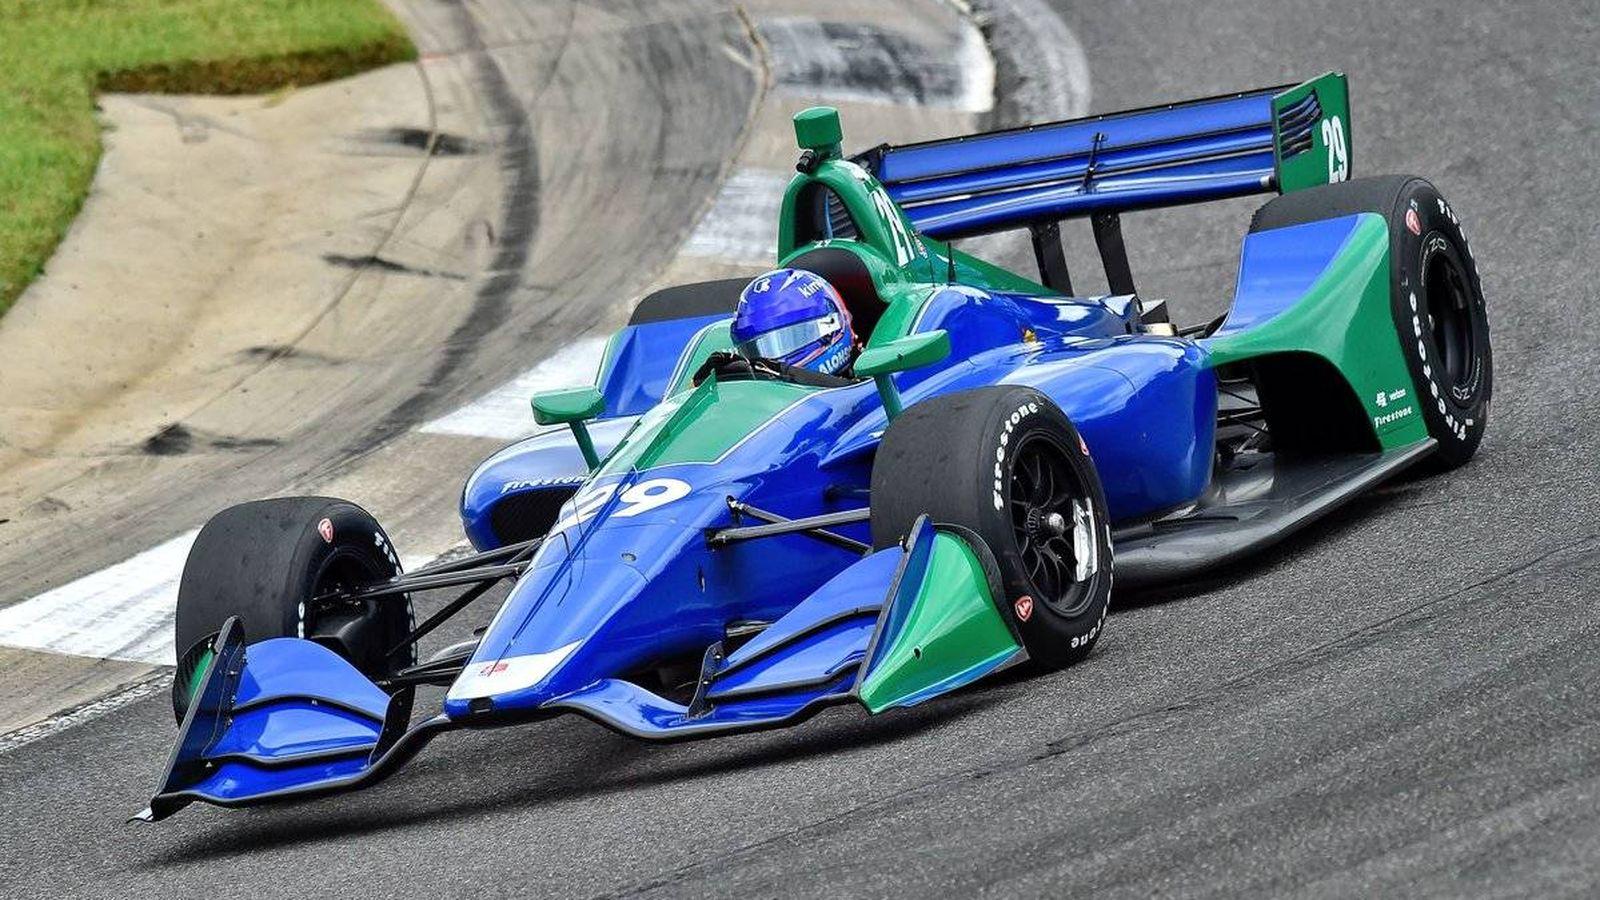 Foto: Fernando Alonso durante su prueba con la escudería Andretti Autosport